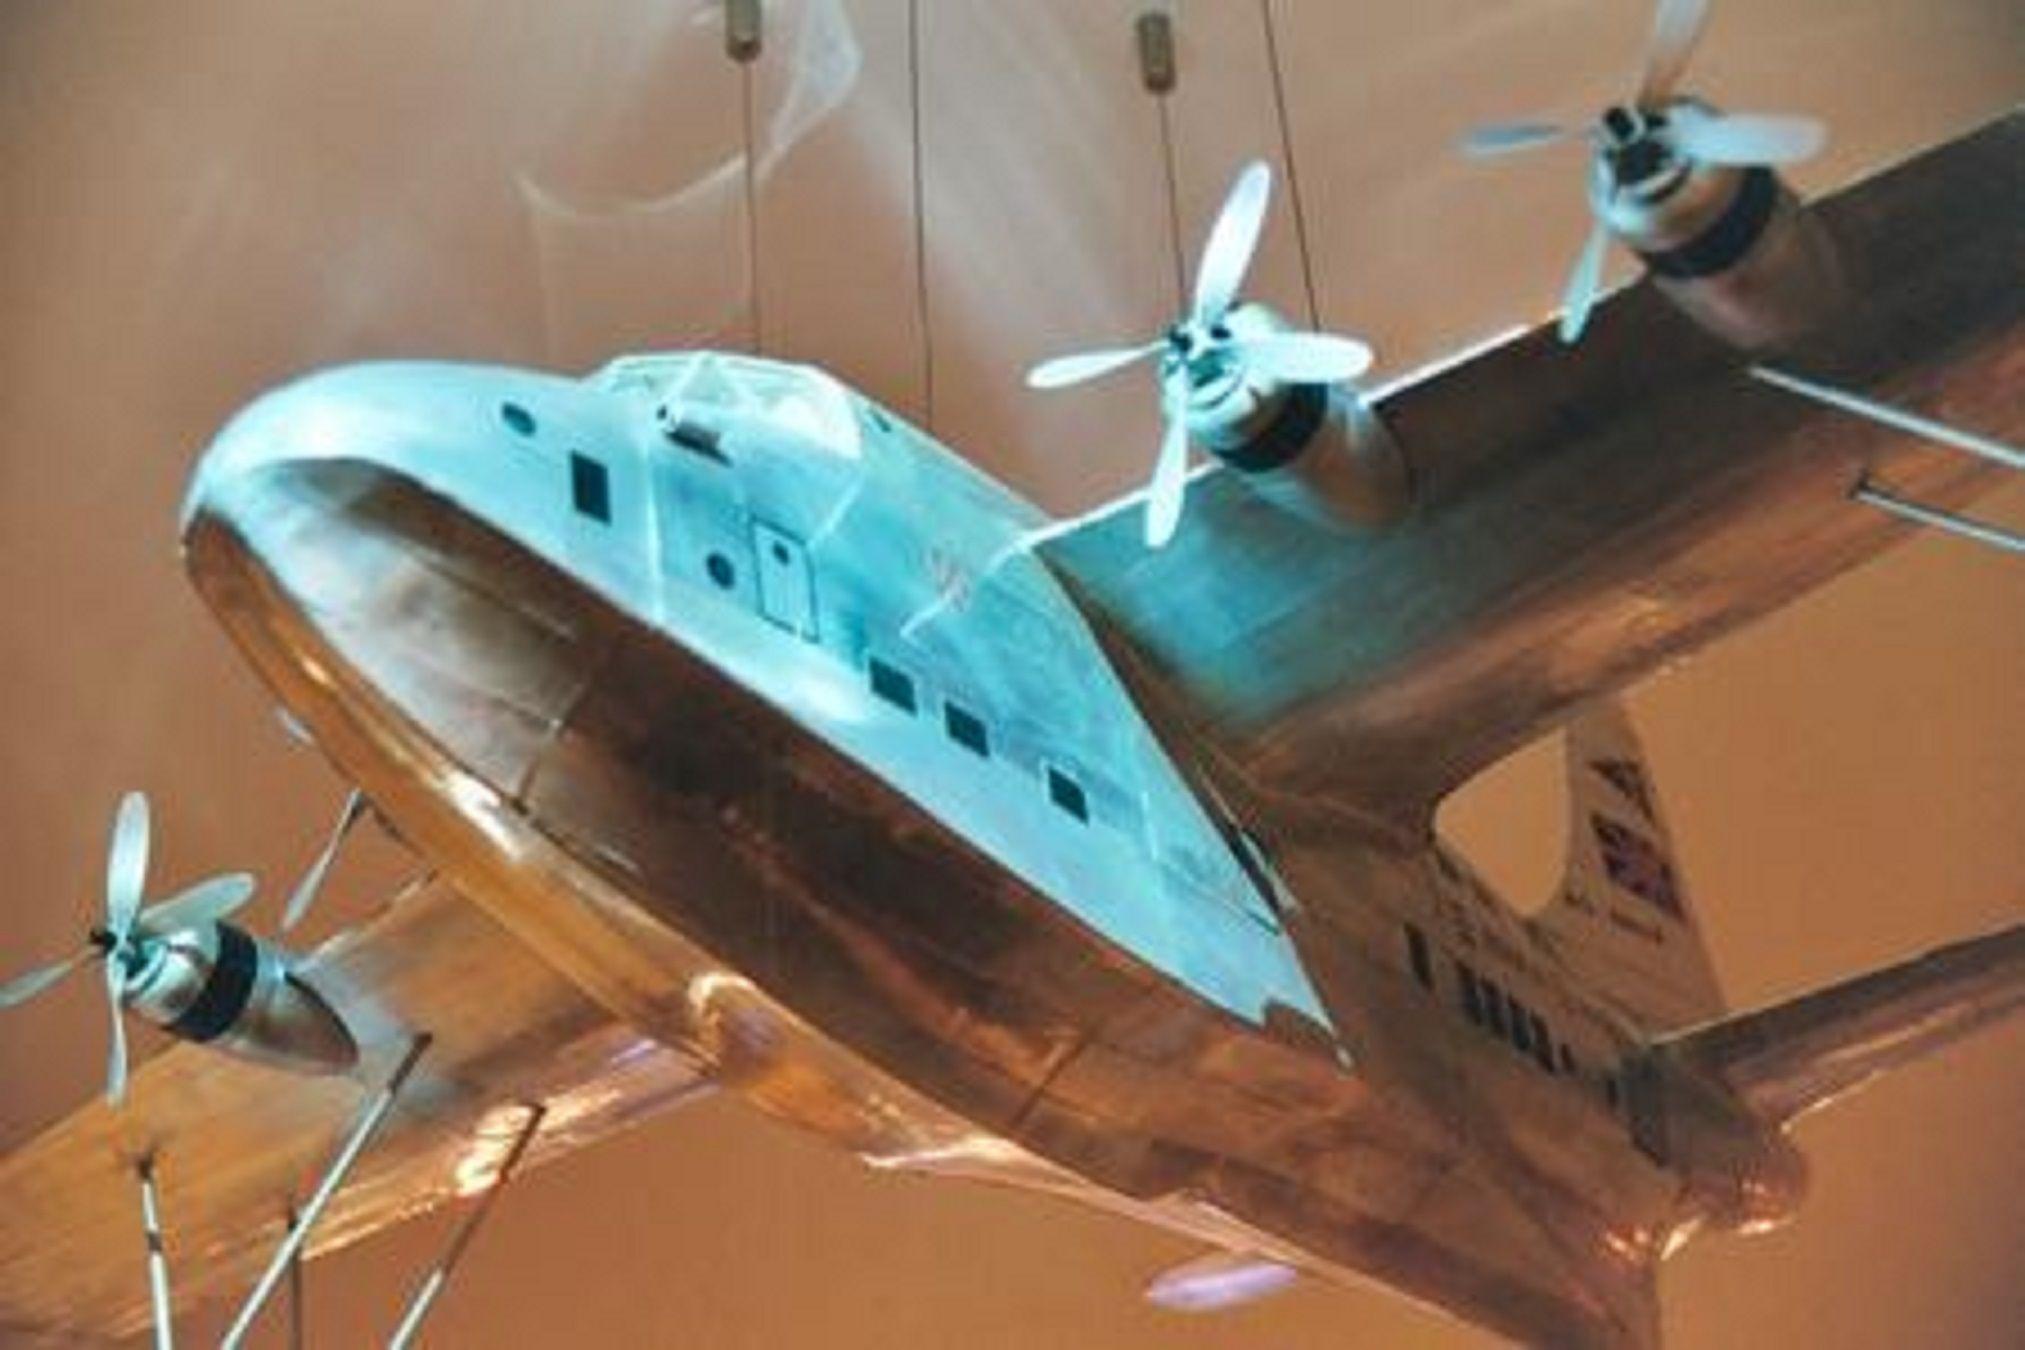 213-6885-Aquila-Airways-Model-Plane-Premier-Range